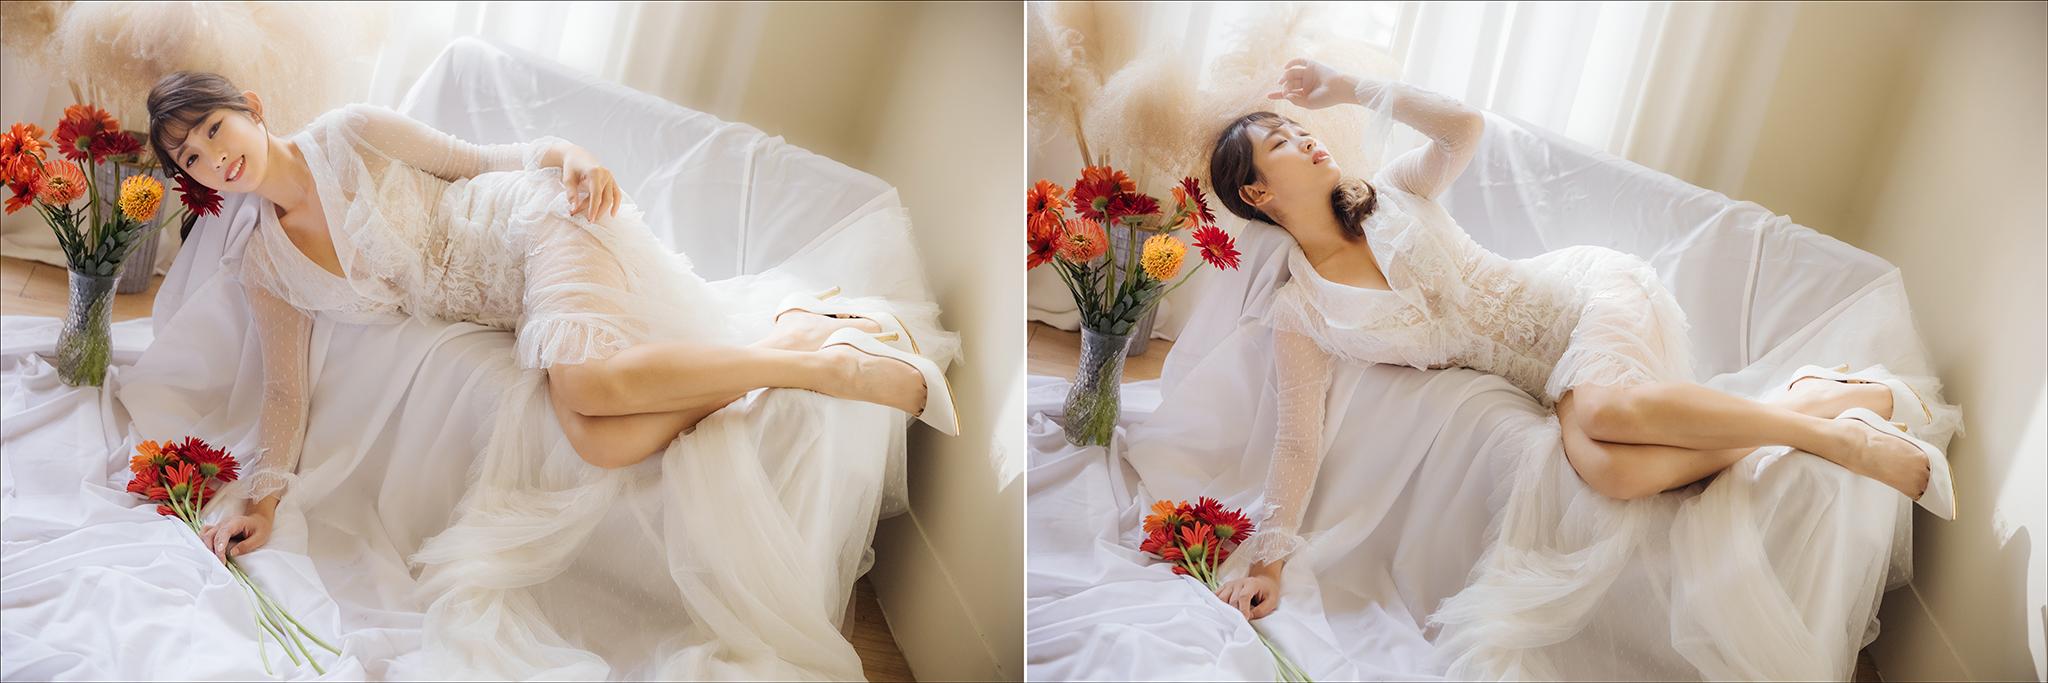 51577688448 4b06fbaae4 o - 【自主婚紗】+江jiang+